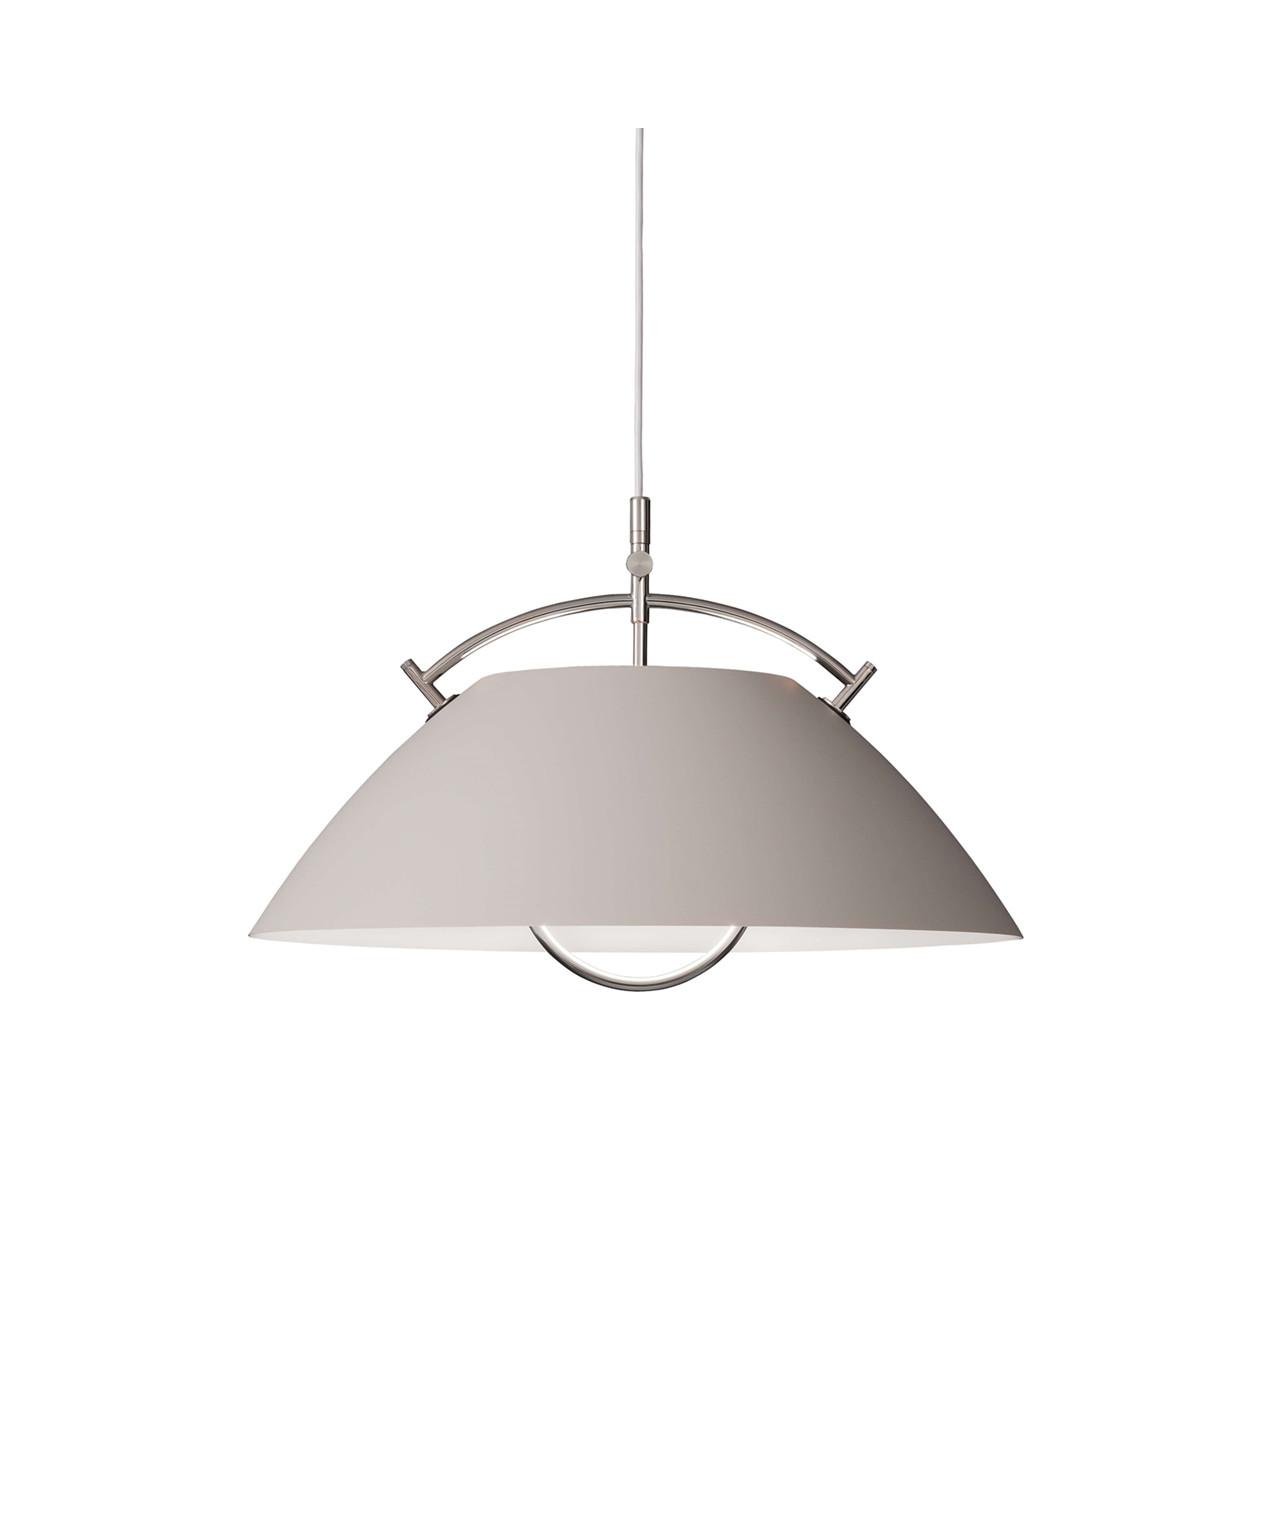 Tidsmæssigt Hans J. Wegner ist für die Pendant & Opala Lampen bekannt XN-13